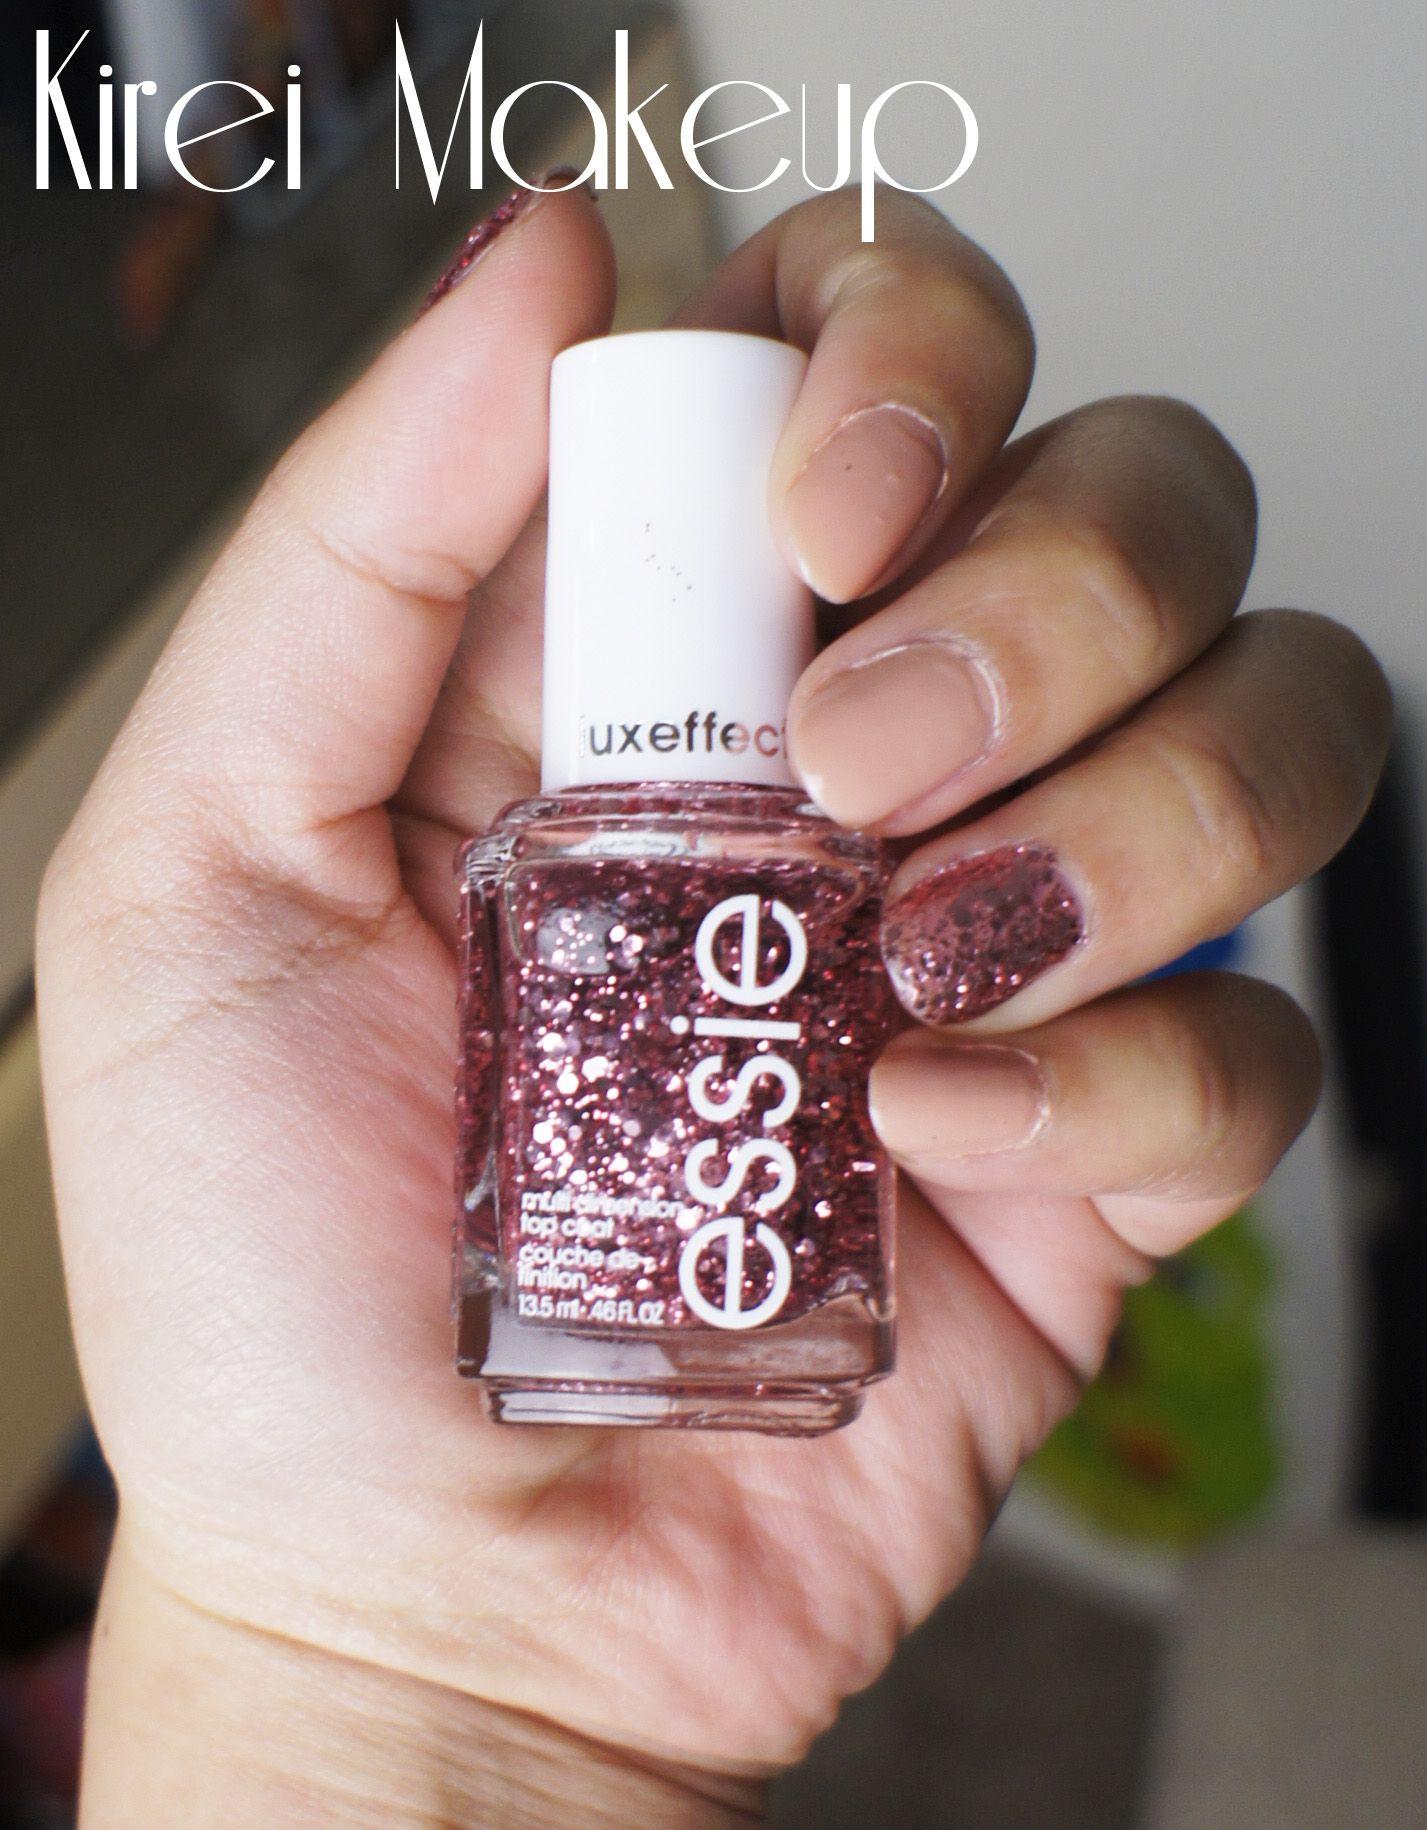 Pin by daniellegriffin on Claws | Pinterest | Glitter nail polish ...